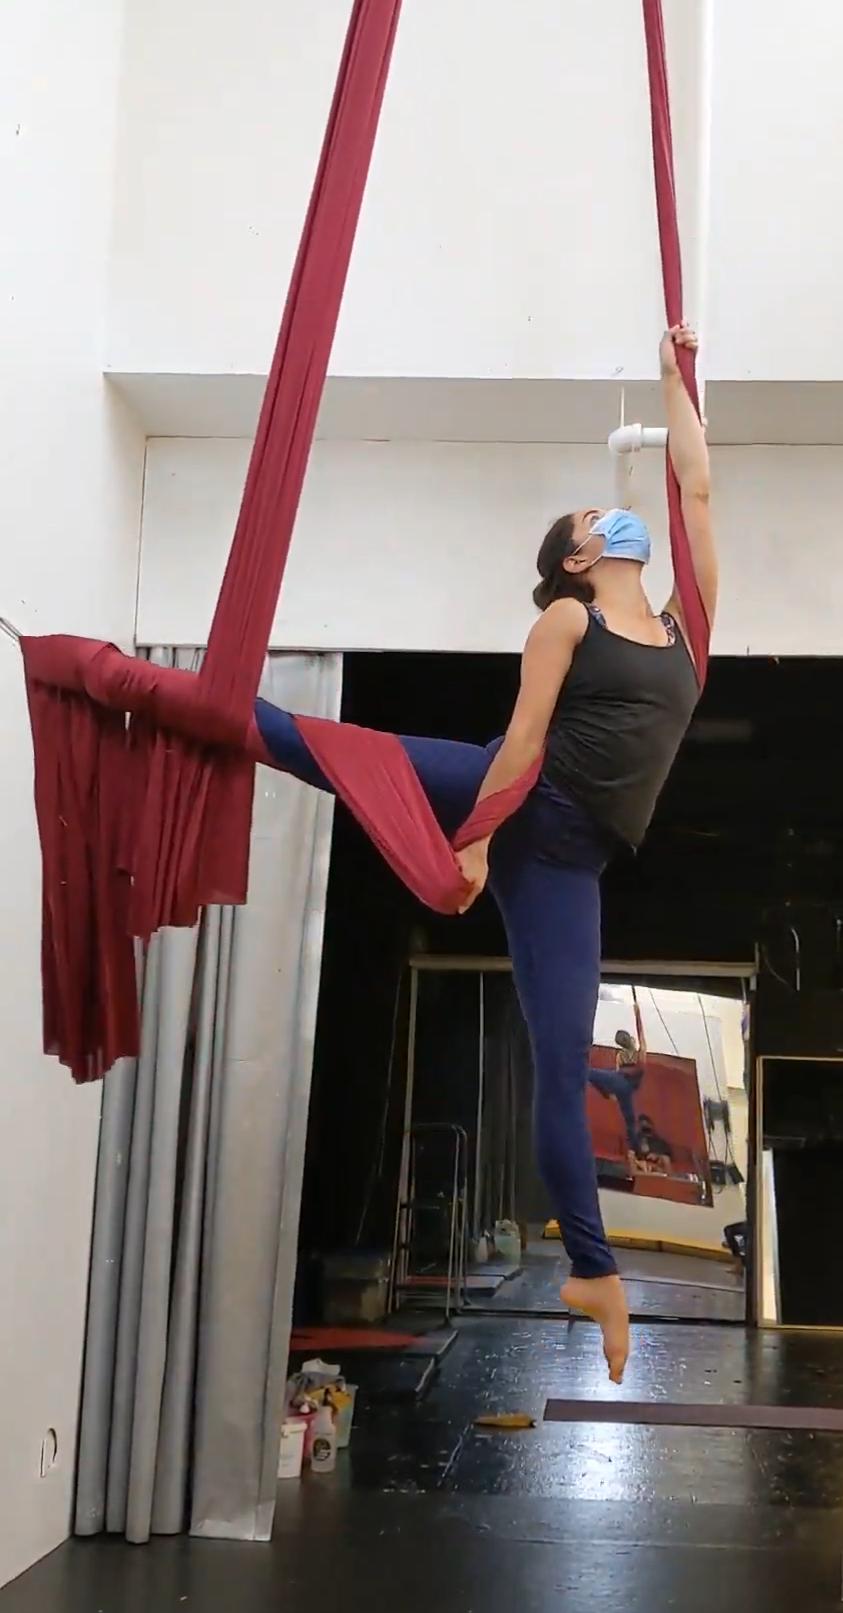 lauren-macleod-aerial-silks